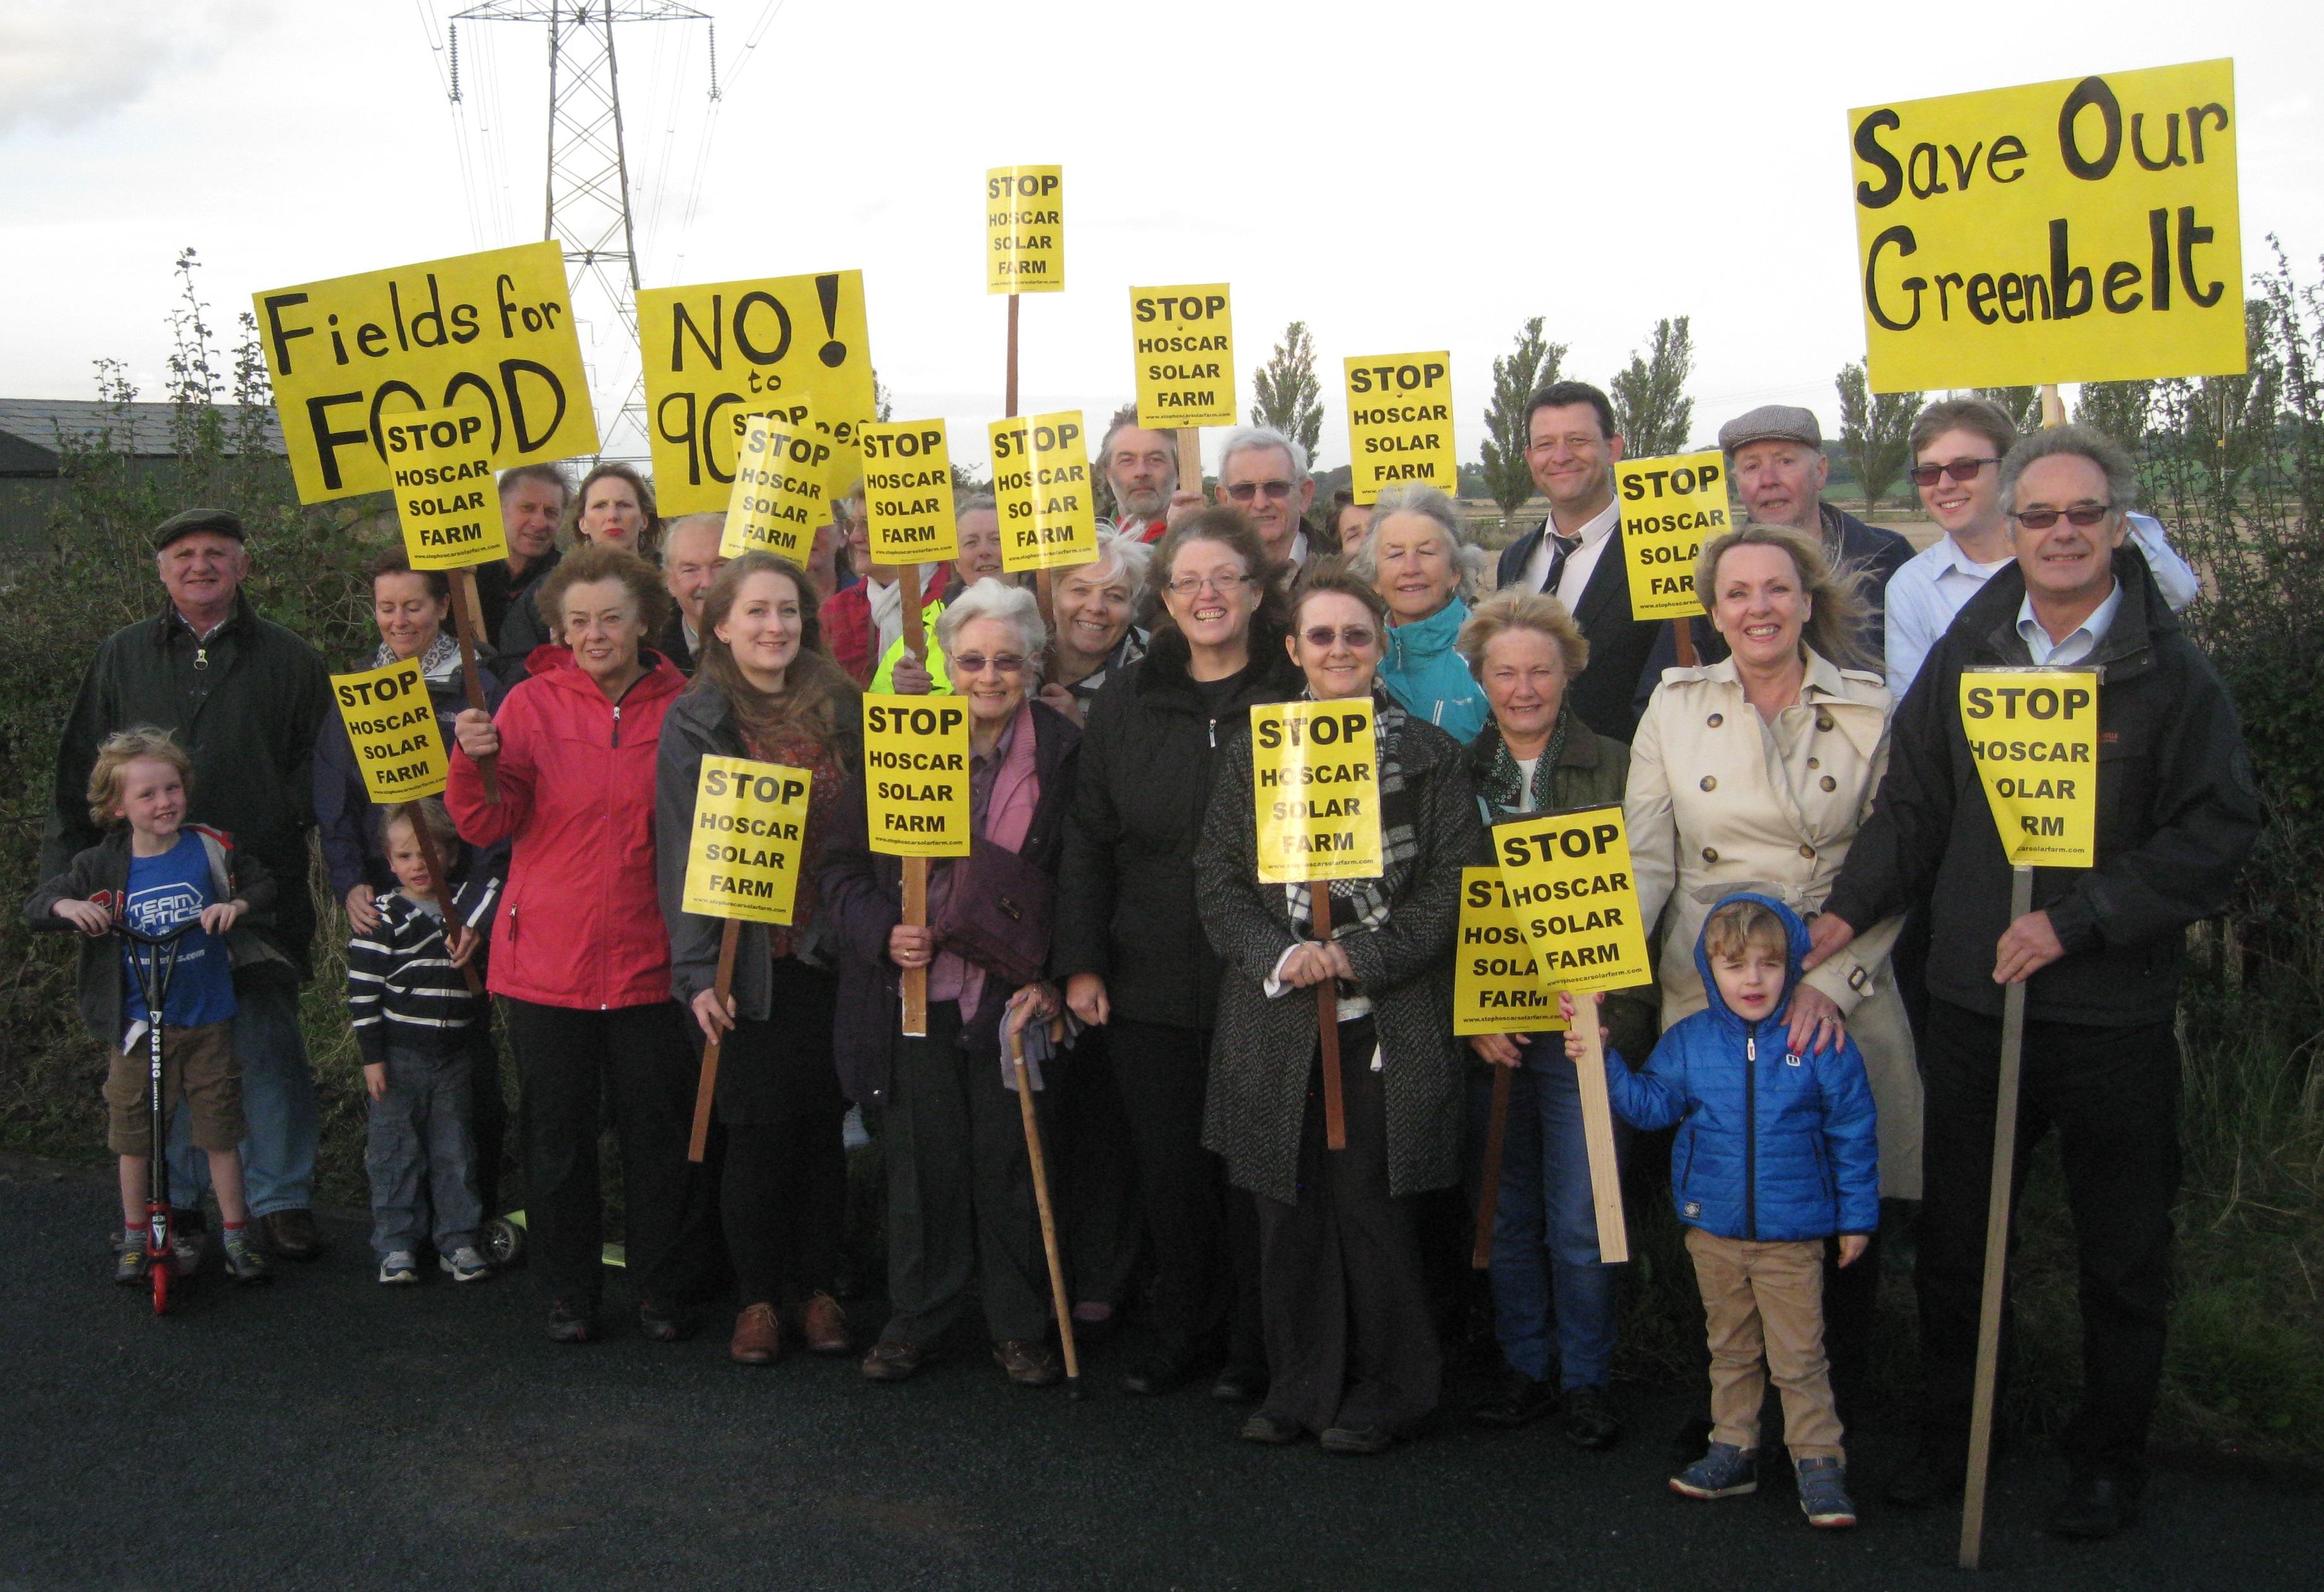 Rosie_Cooper_MP_with_Stop_Hoscar_Solar_Farm_campaigners_at_Hoscar_Solar_Farm_site.jpg